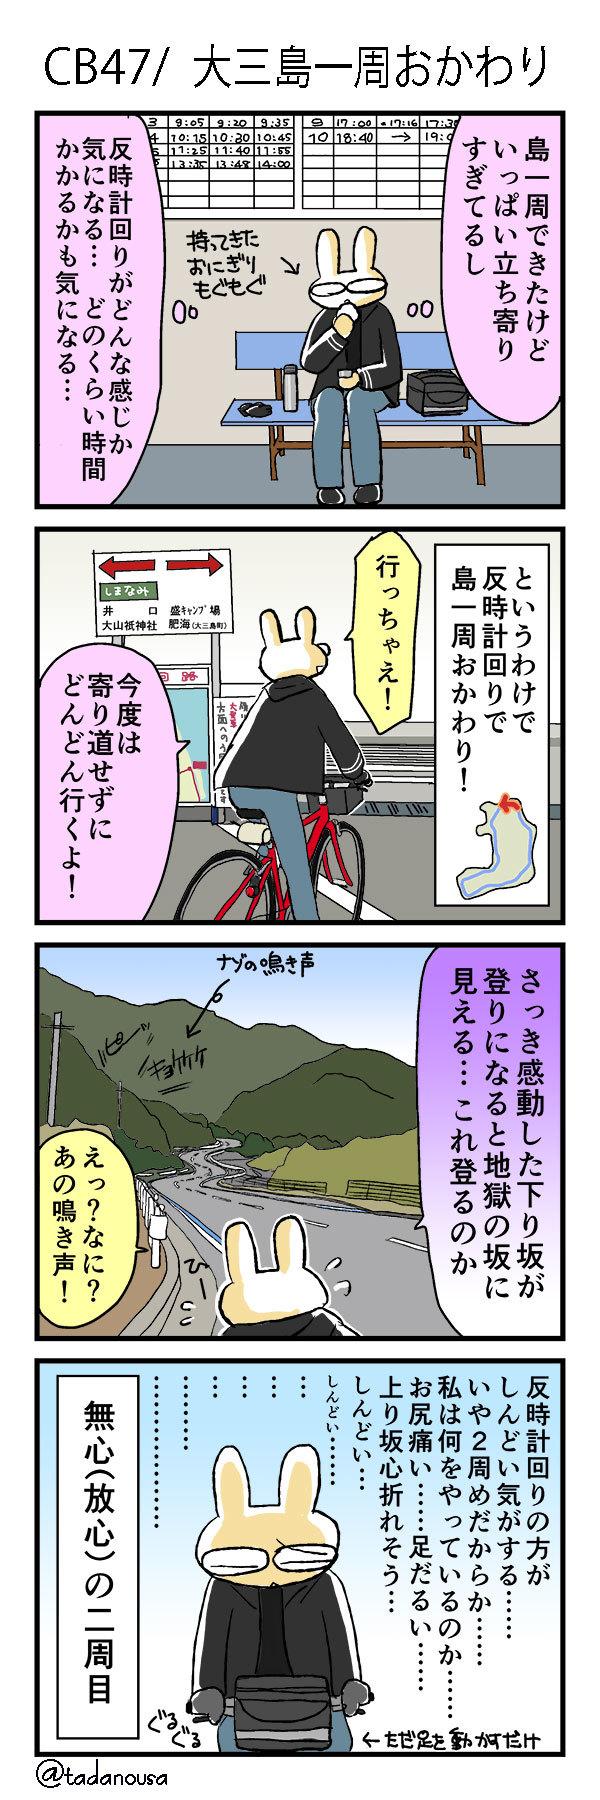 bike_4koma_kako087_s.jpg